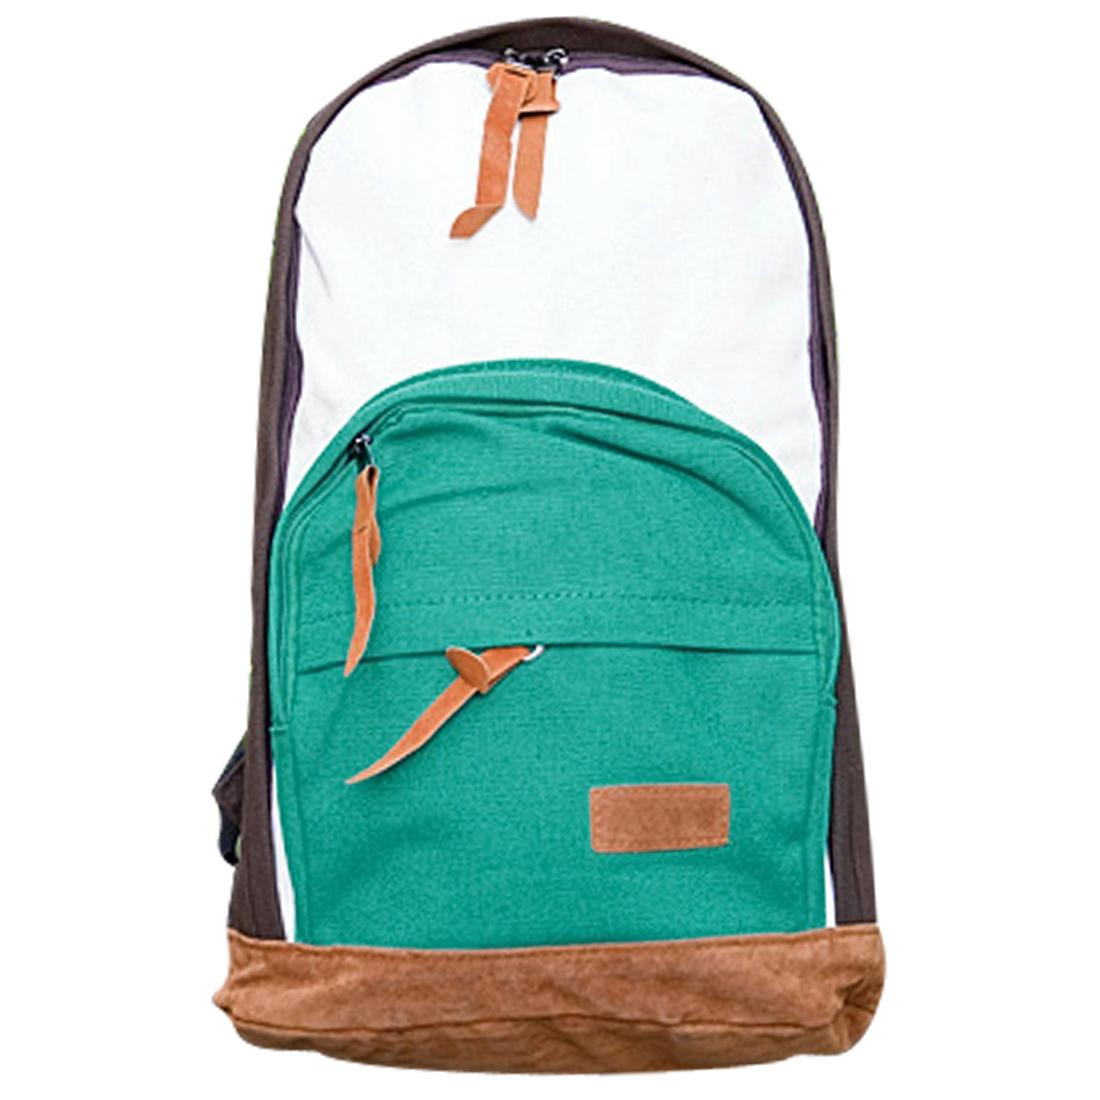 Men Adjustable Straps Front Pockets Zip Up Backpack Coffee White